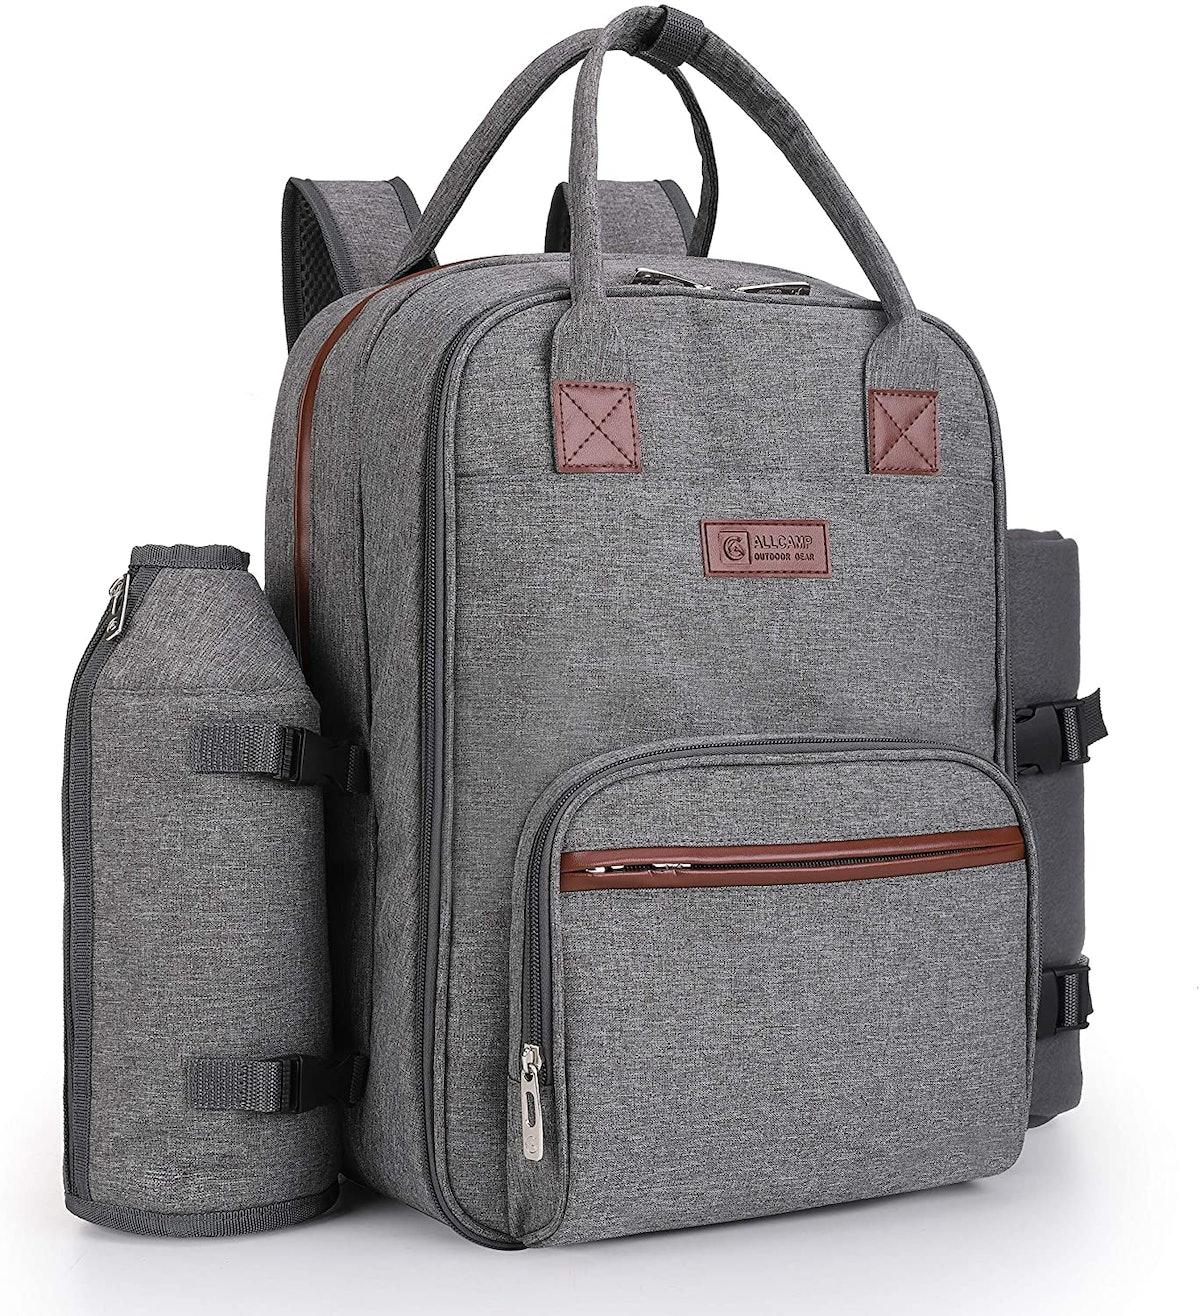 ALLCAMP Picnic Backpack for 2